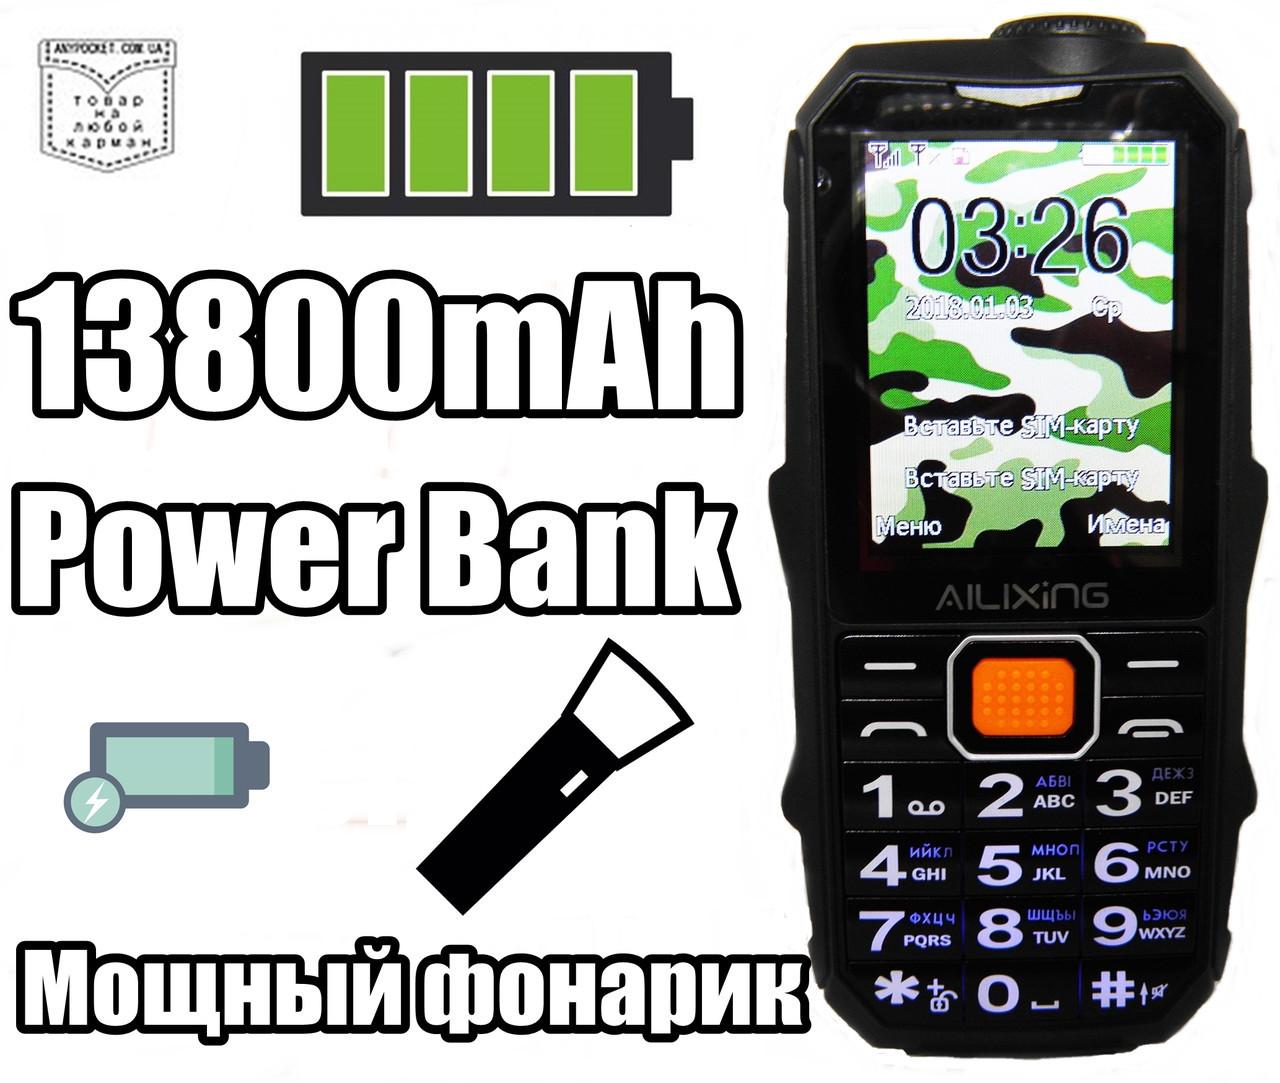 Land Rover s888 13800mah противоударный телефон power bank фонарик